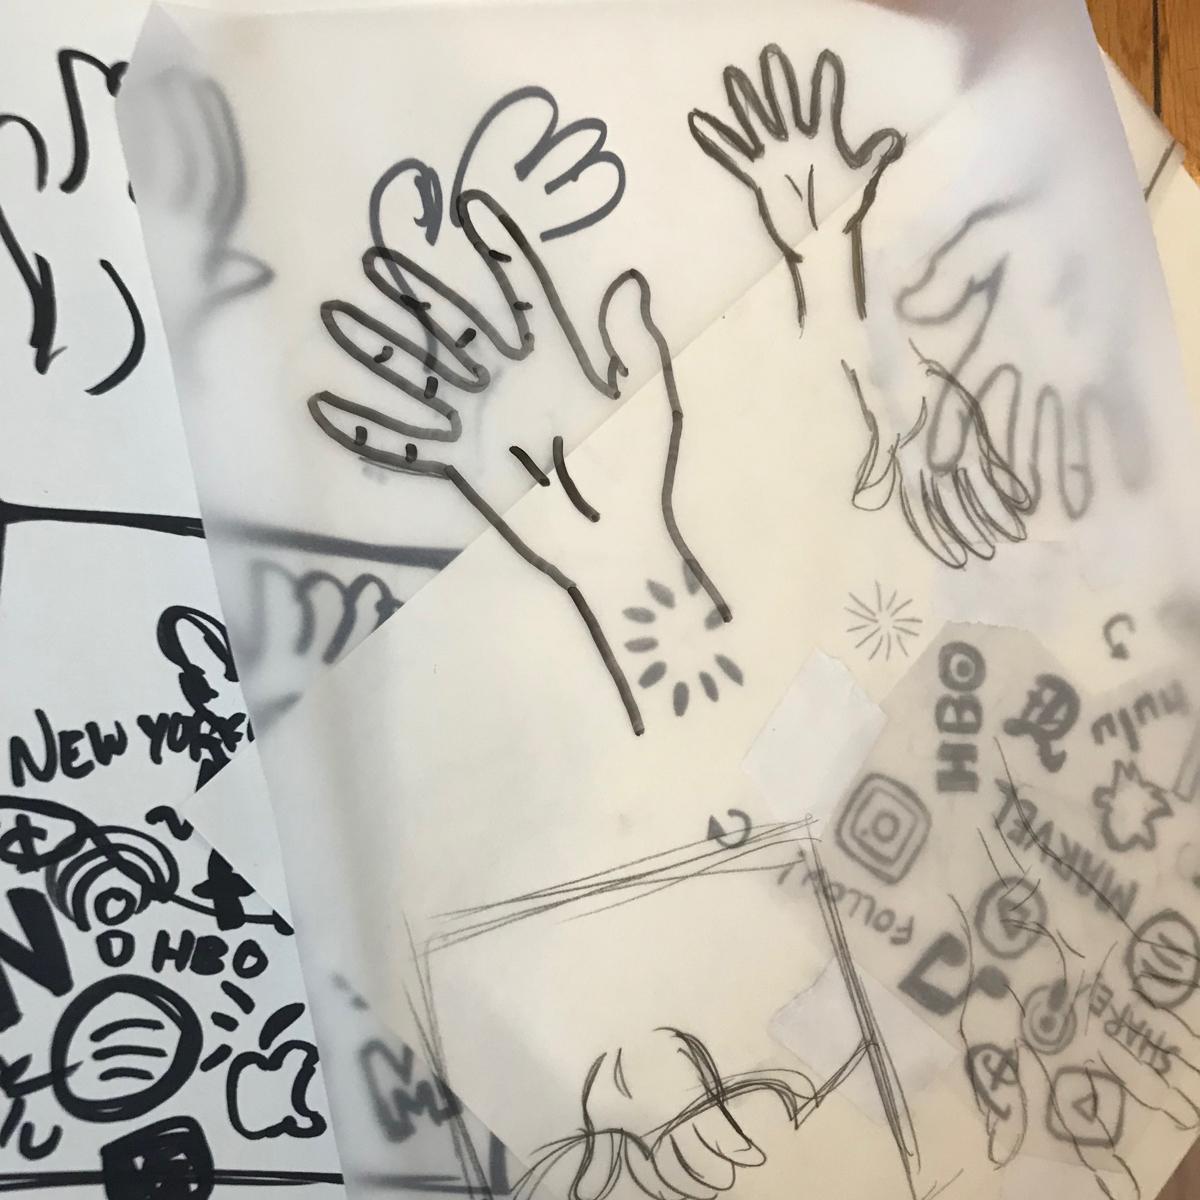 Sketches, sketches, sketches!